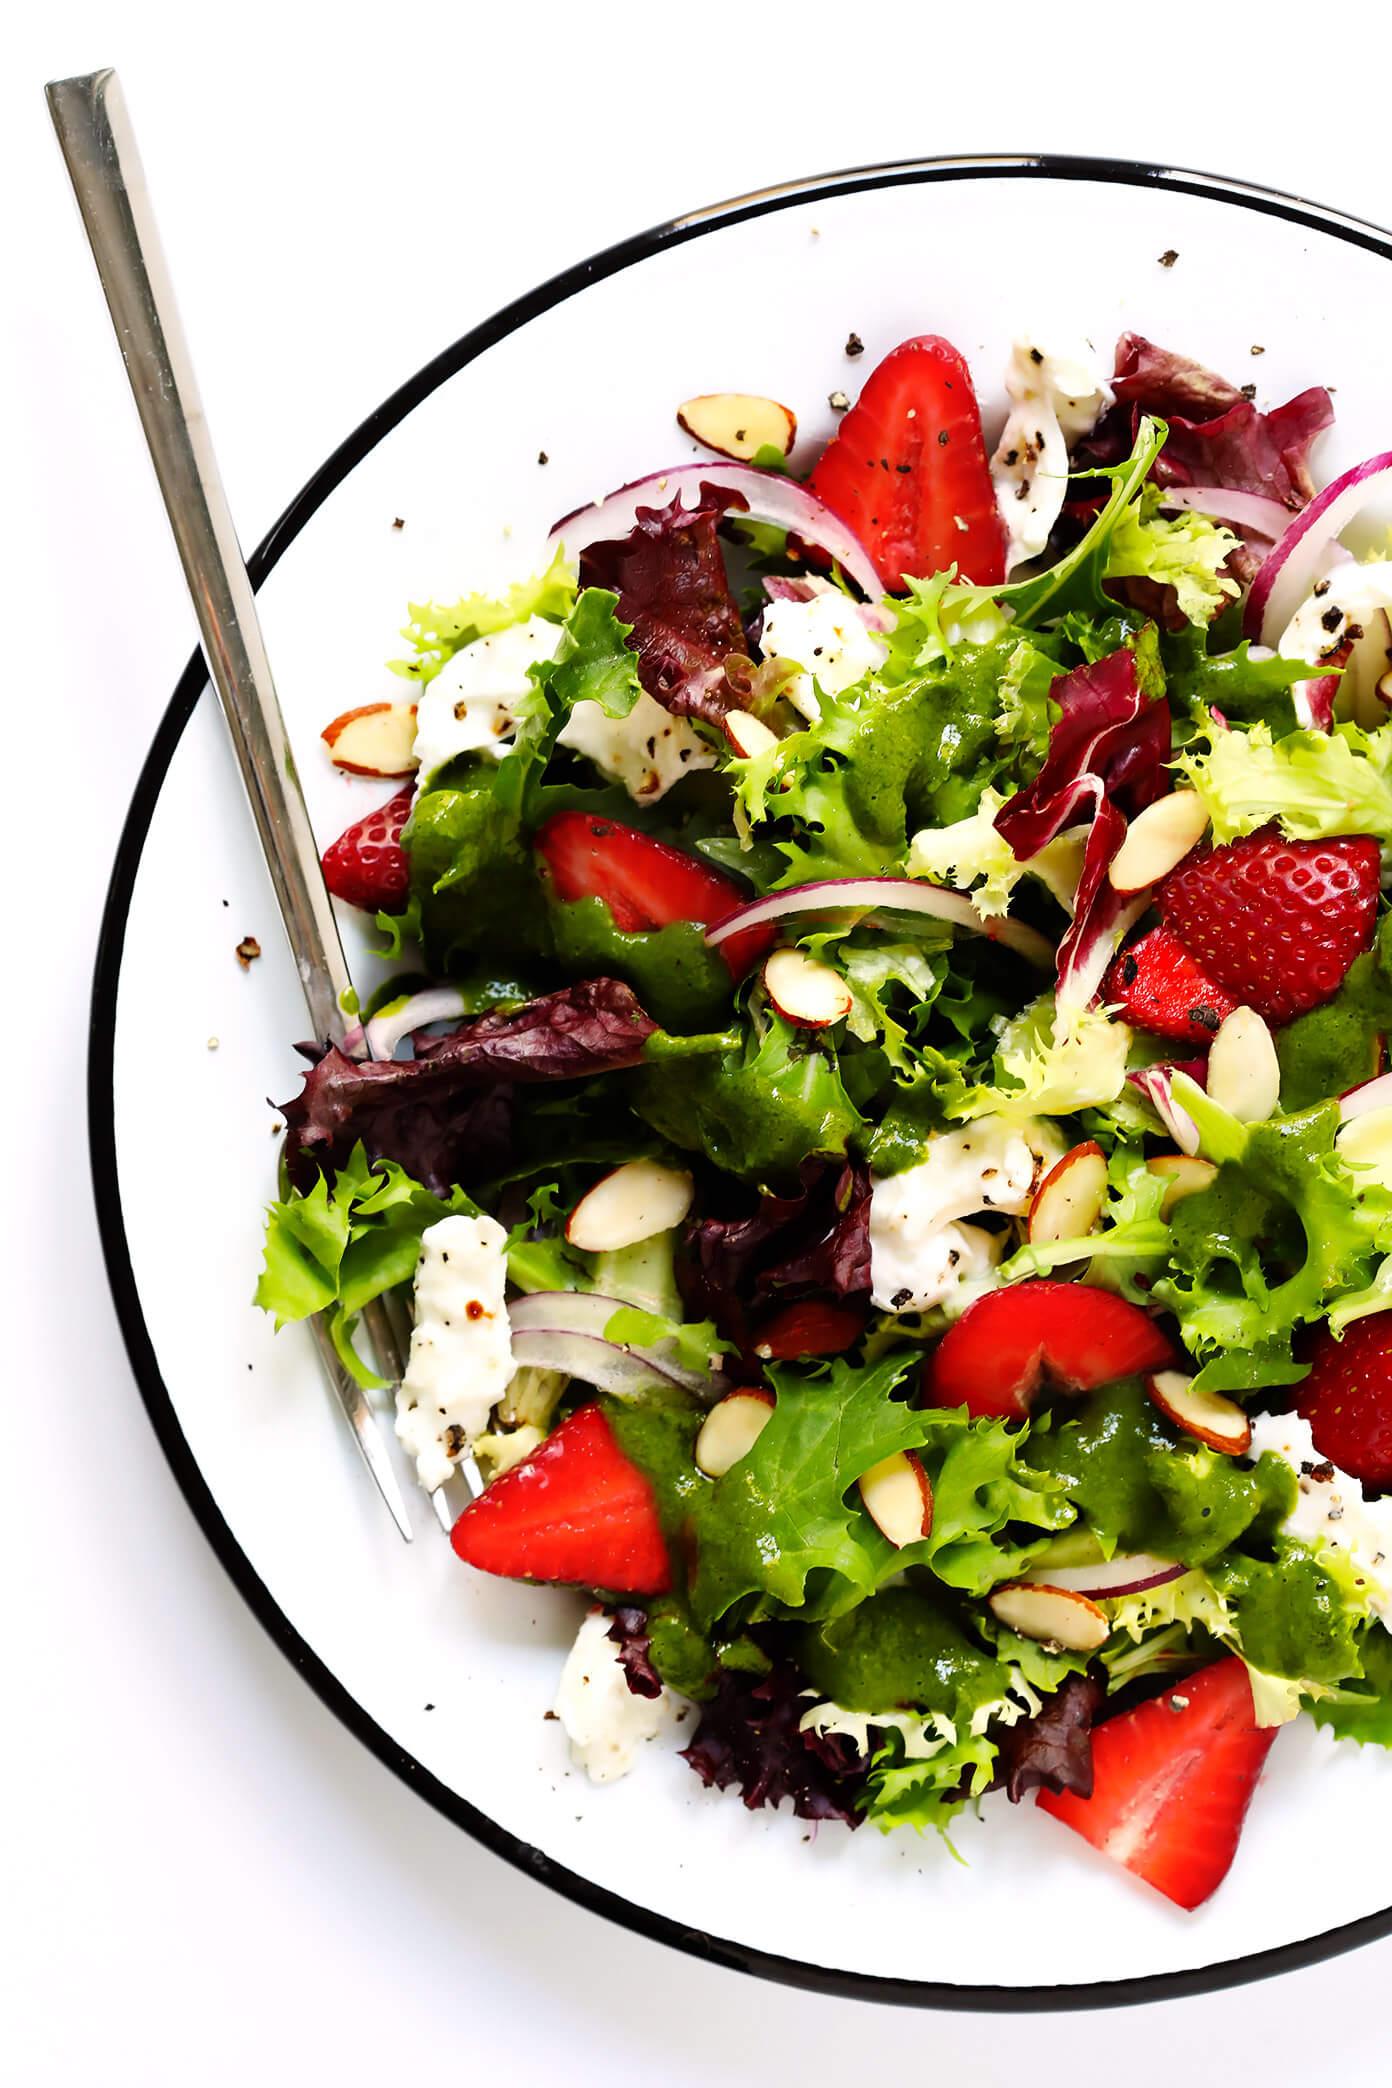 Strawberry Burrata Salad with Basil Vinaigrette